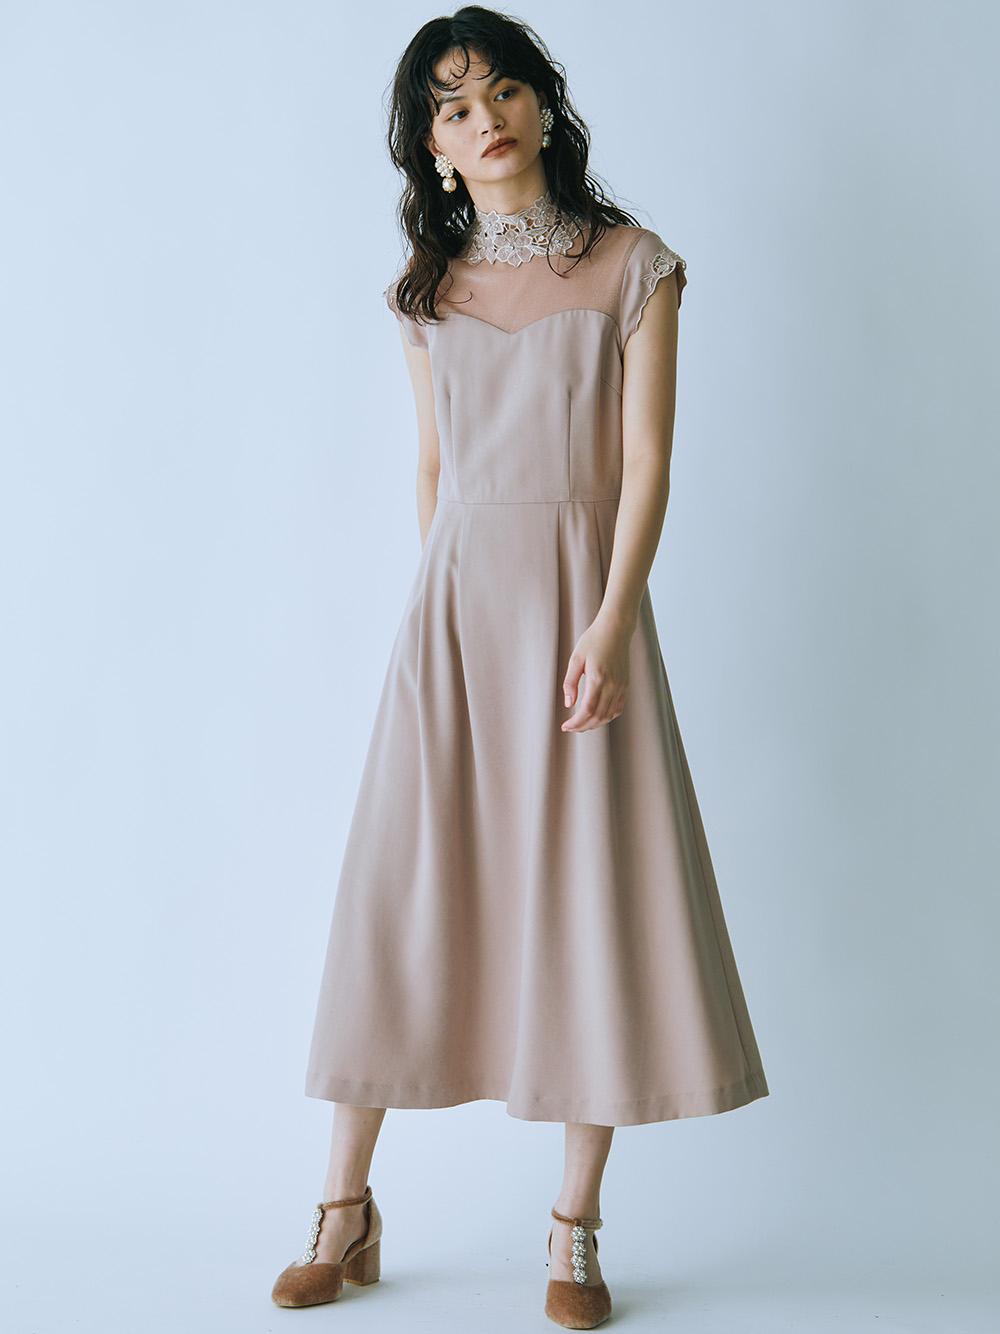 [L.B CANDY STOCK]フラワー刺繍ドレス(BEG-0)